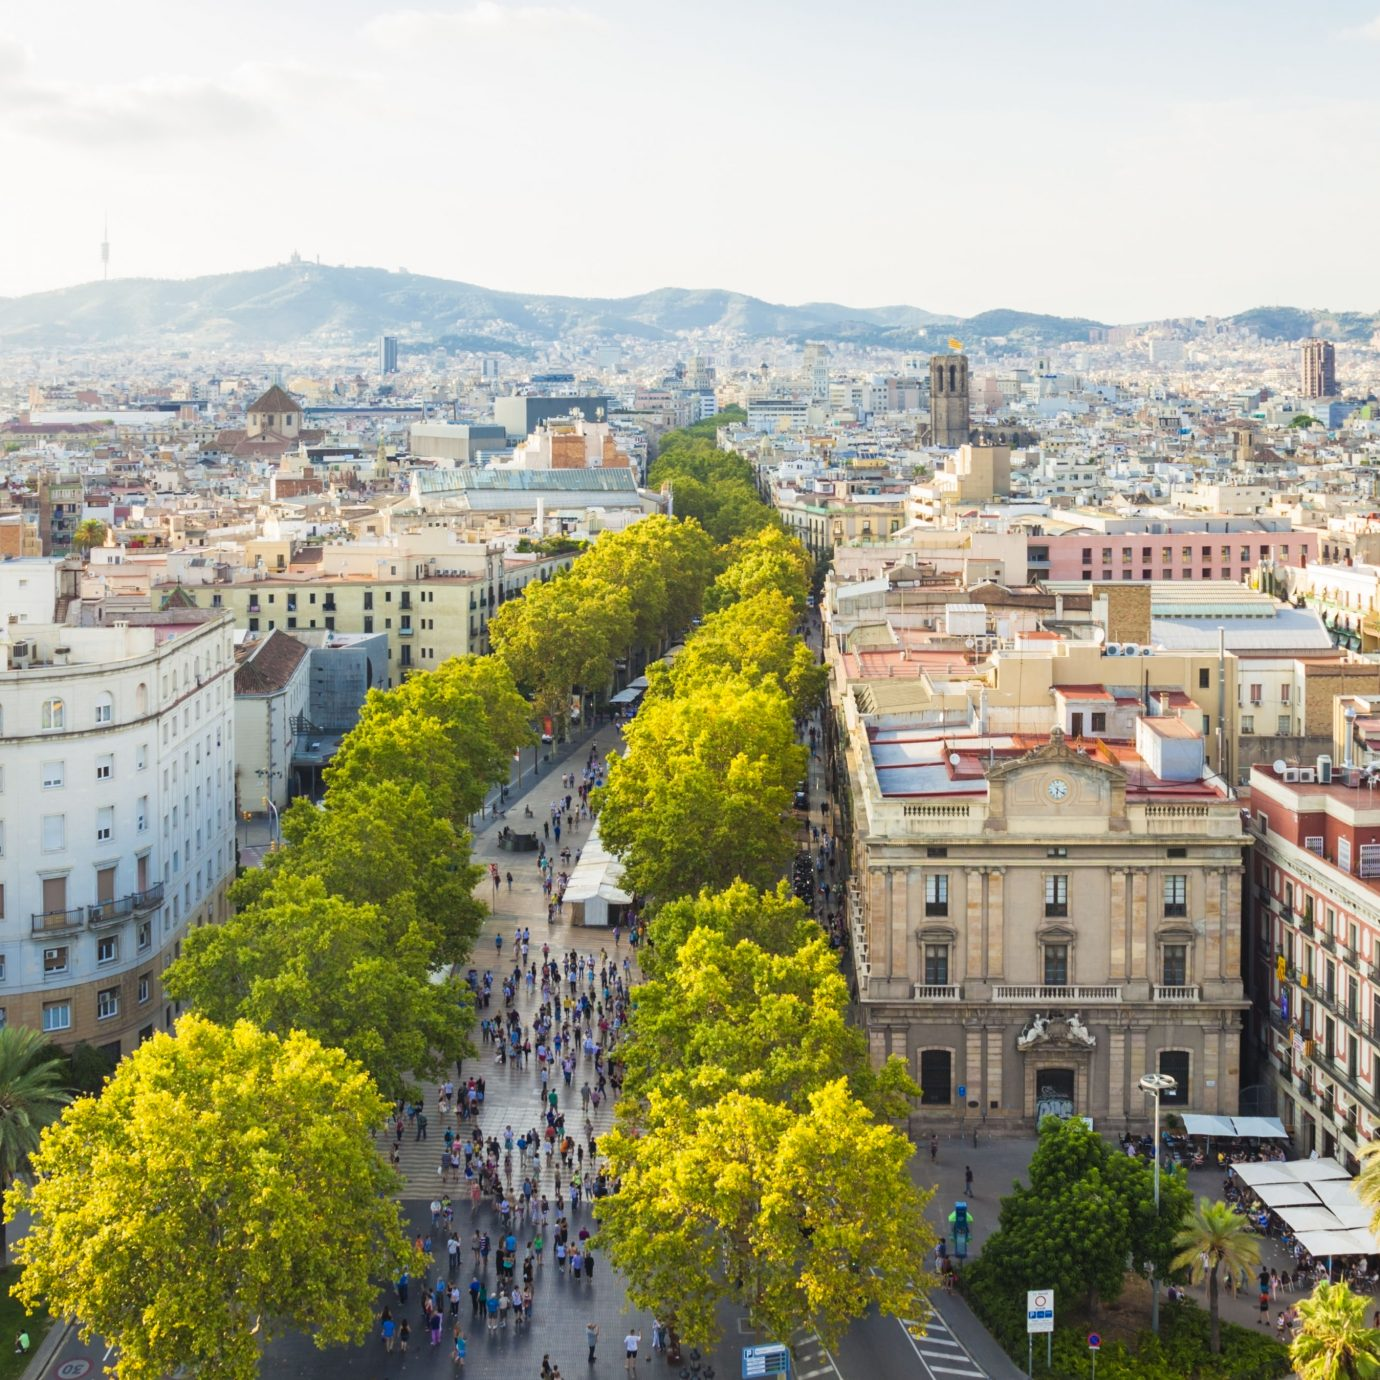 Cityscape of Barcelona with famous La Rambla